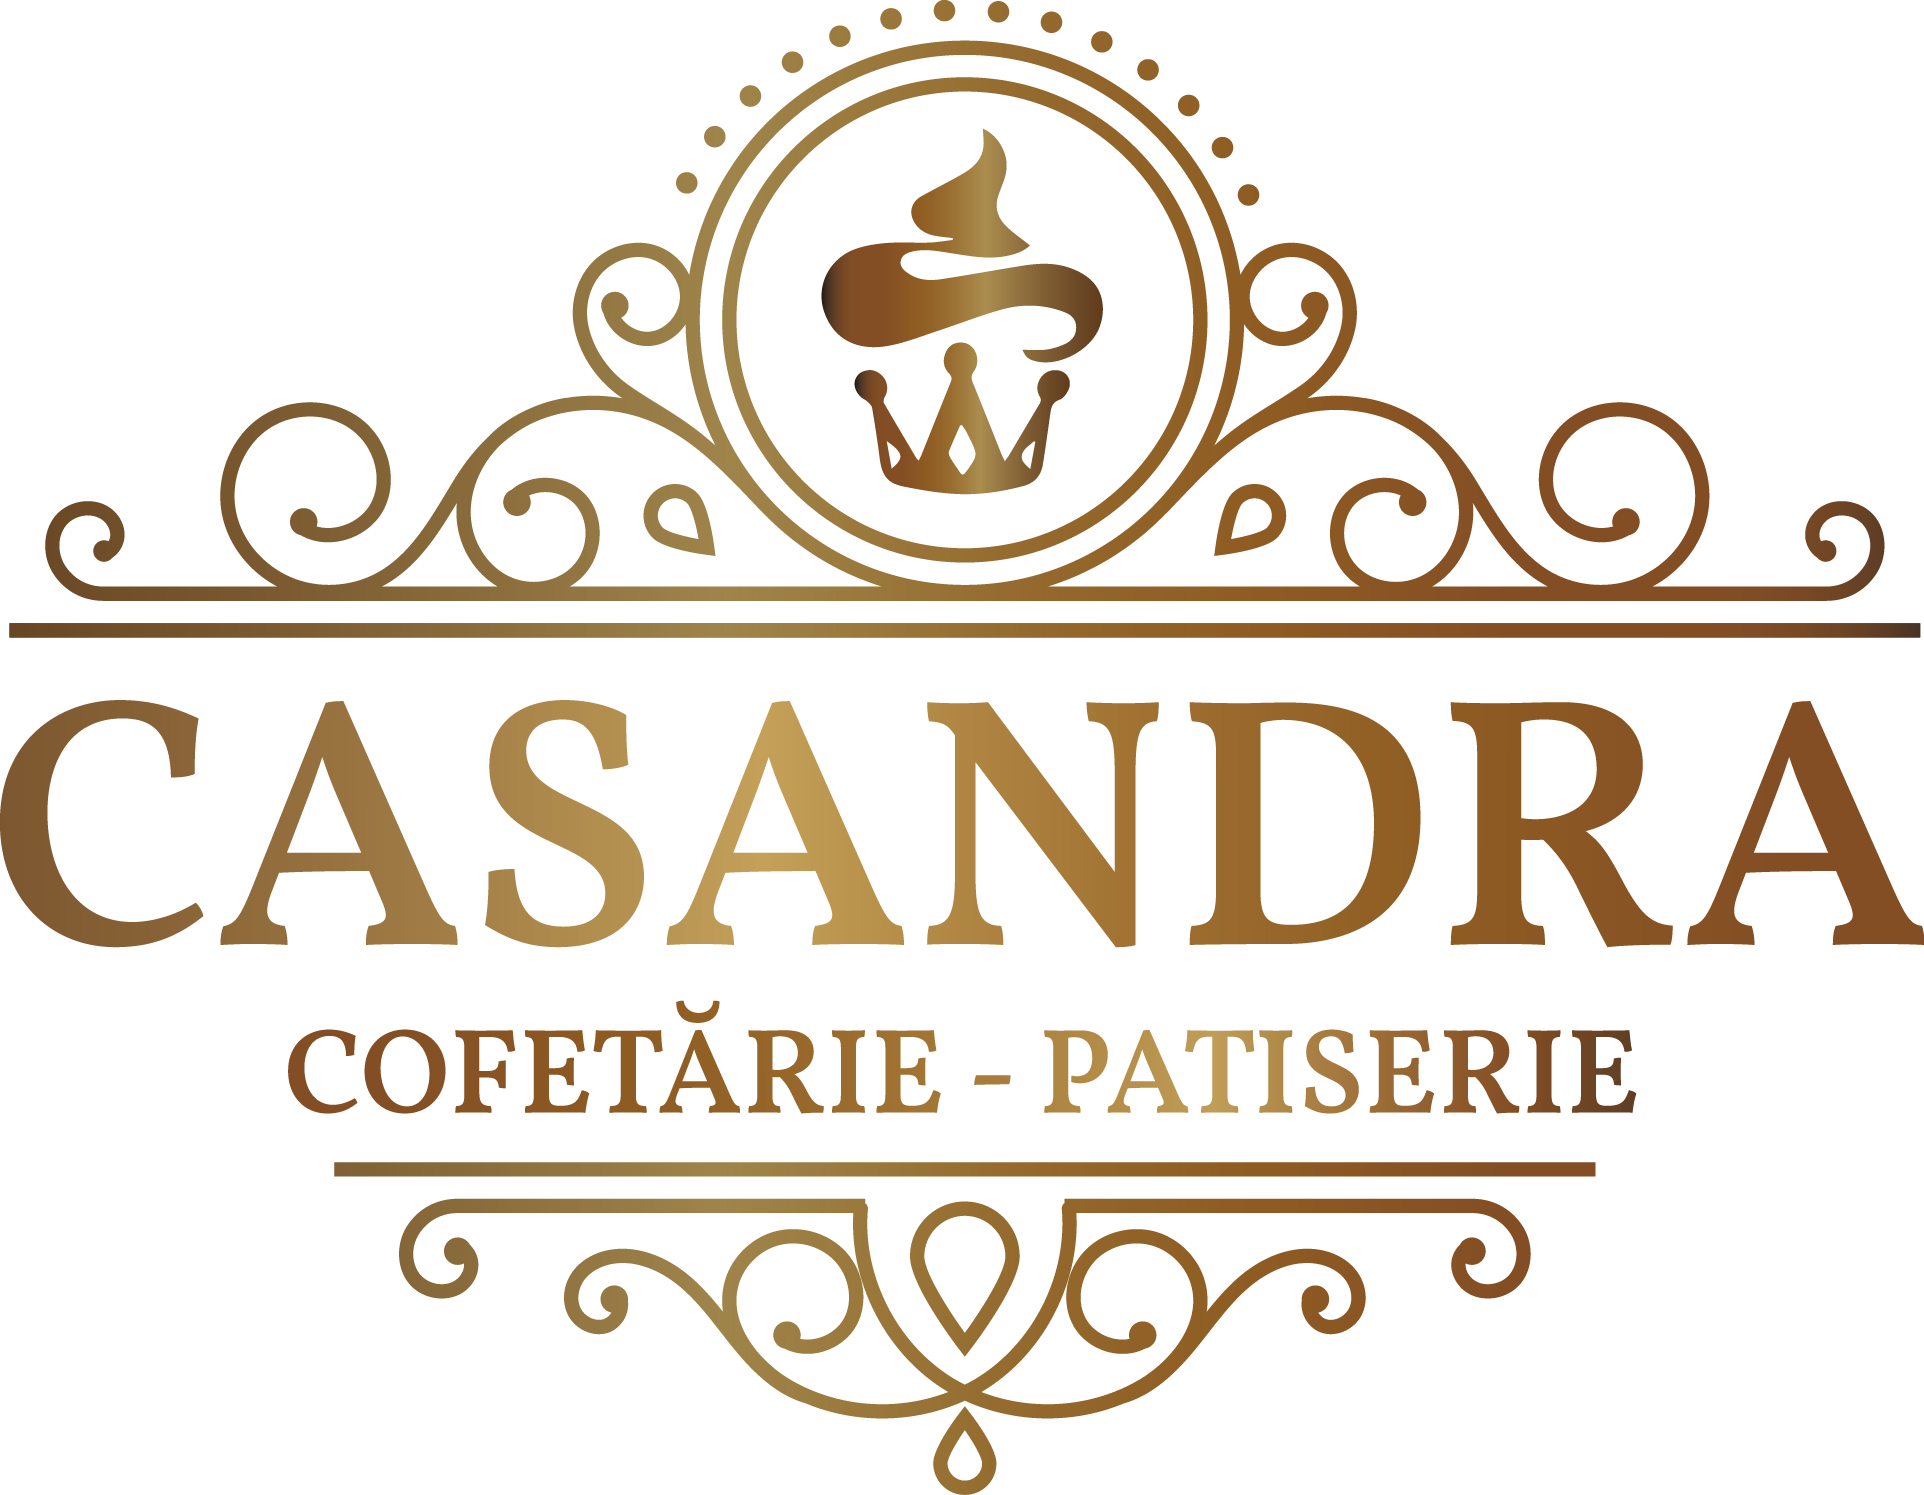 Casandra logo PNG transparent